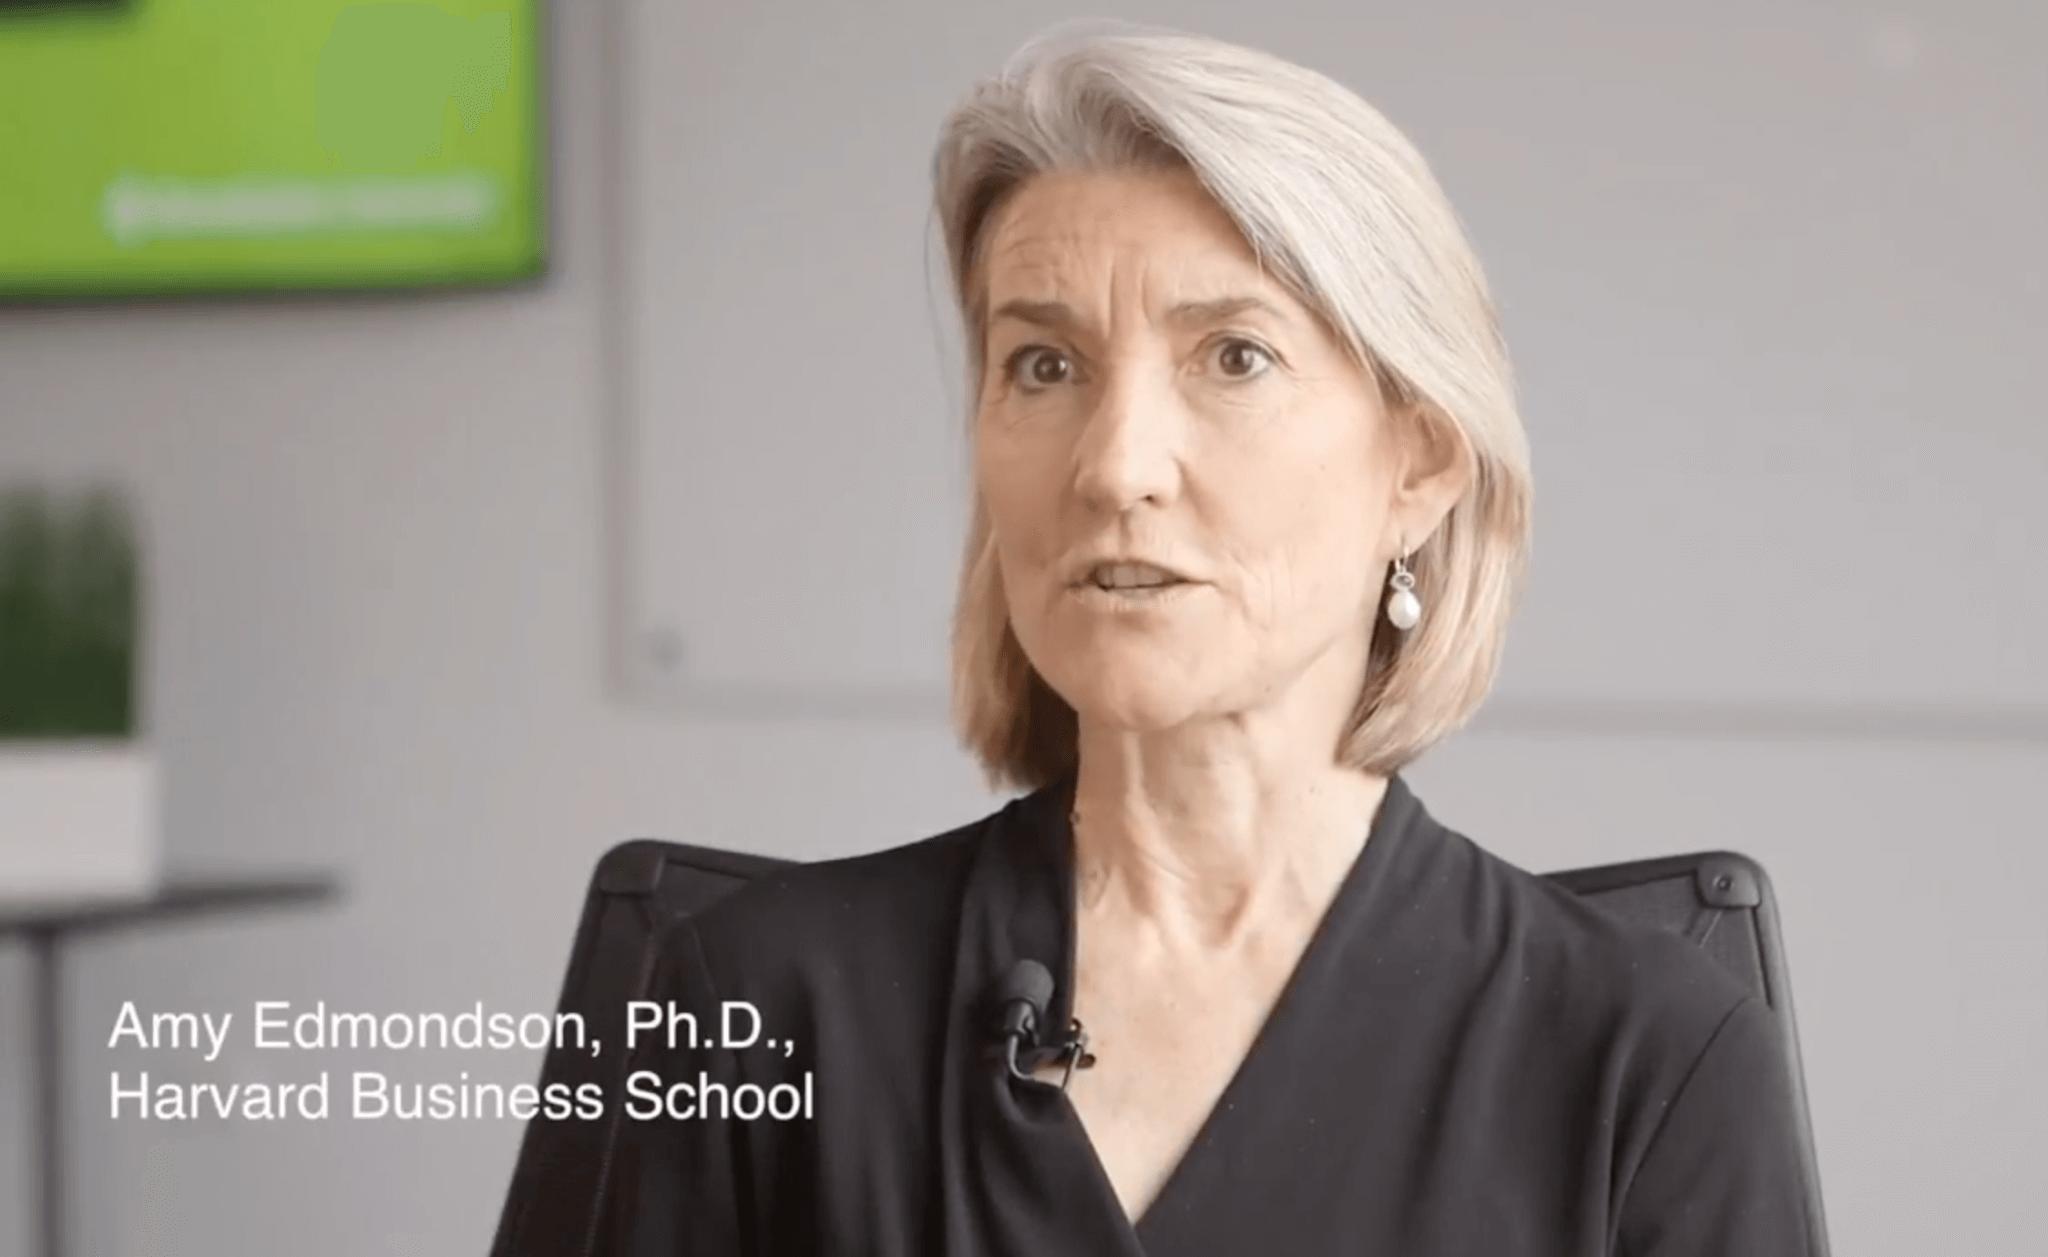 Amy Edmondson Video | Teaming, Purpose, Psychological Safety